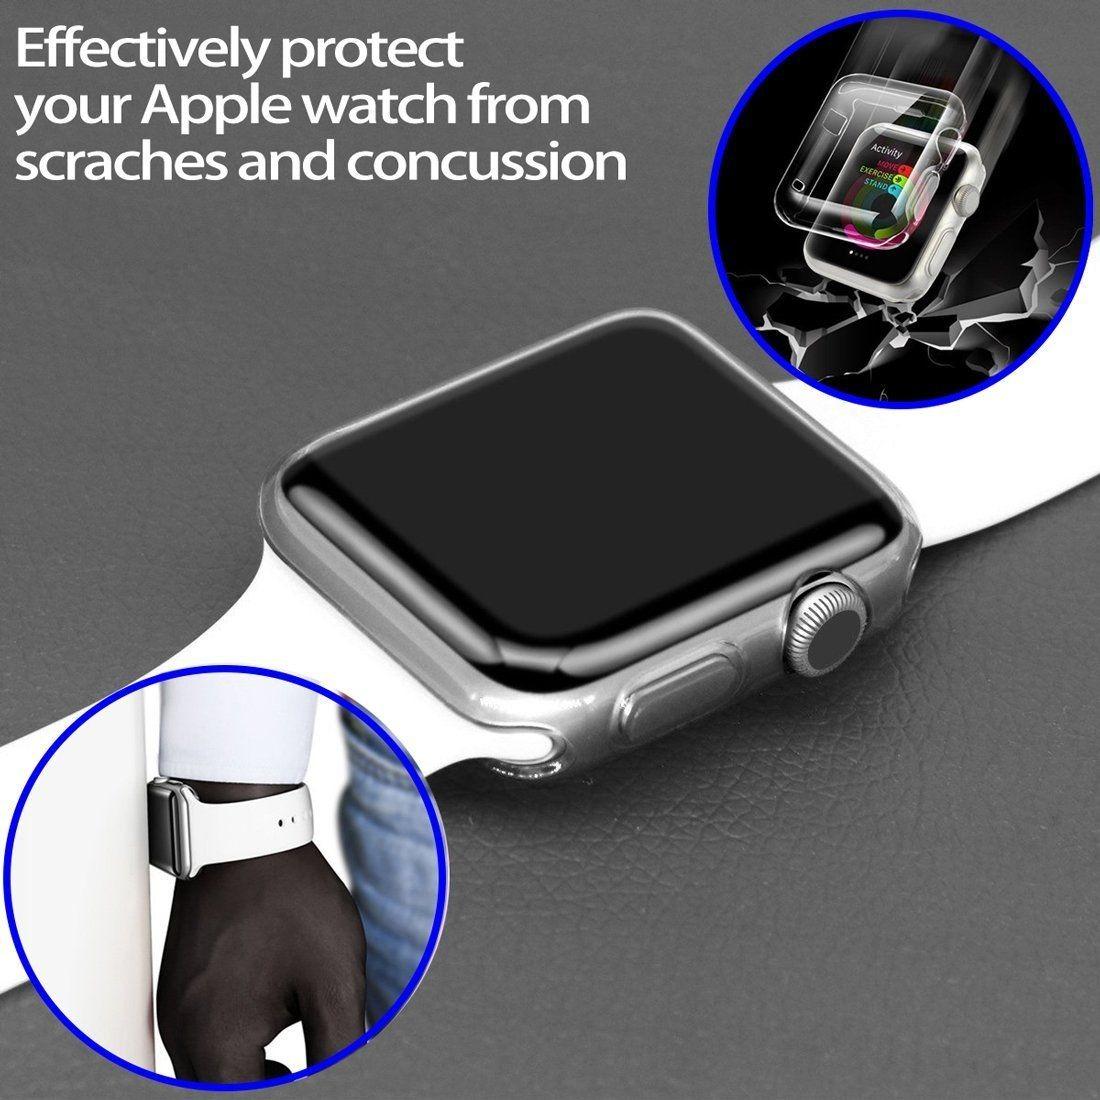 2ffca89a6ee capa tpu relógio apple iwatch 3 42mm. 11 Fotos